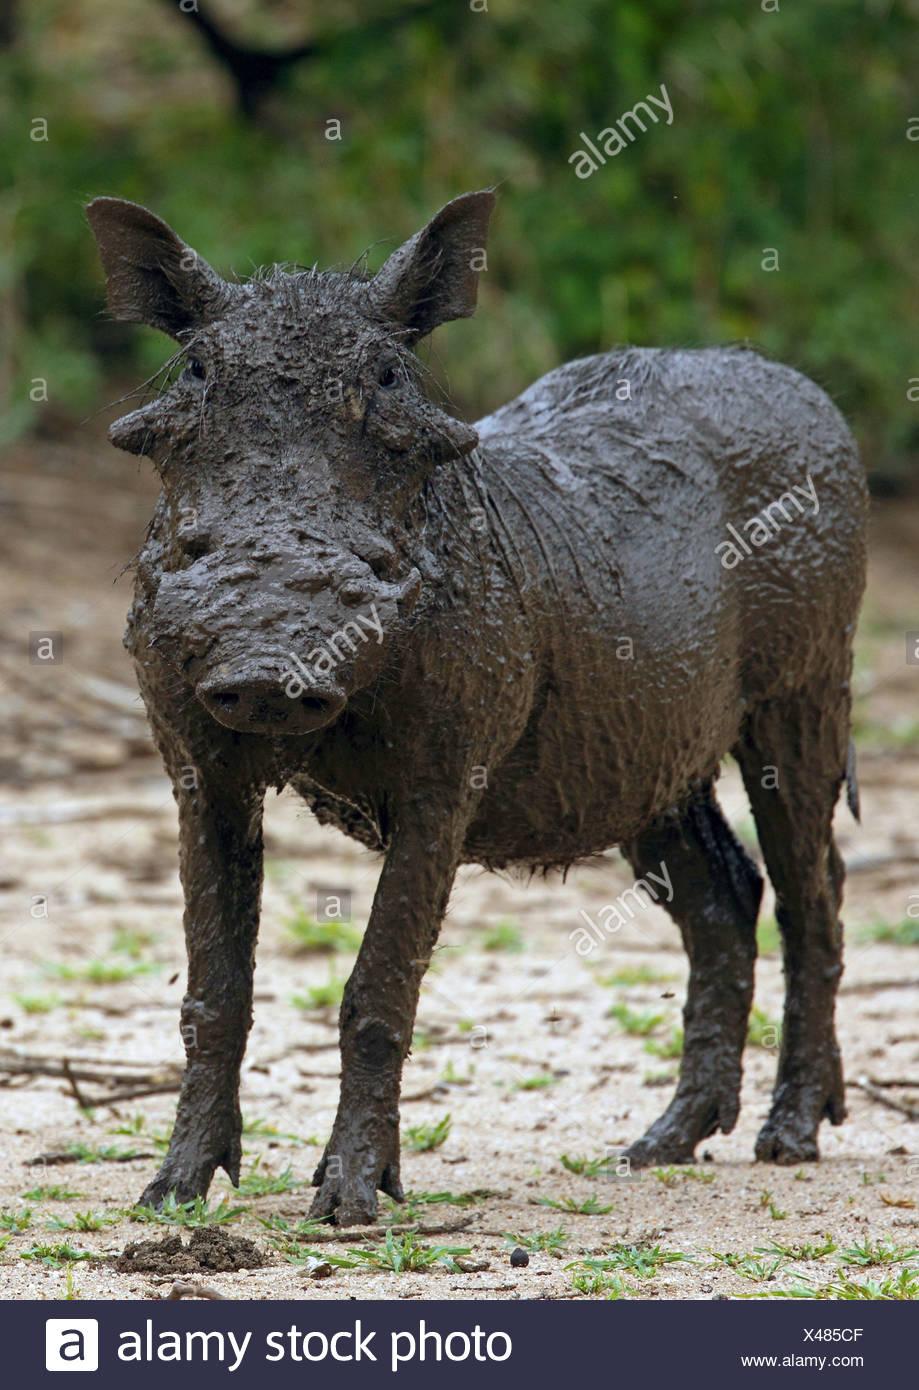 Cape warthog, Somali warthog, desert warthog (Phacochoerus aethiopicus), quite filthy warthog, Tanzania, Lake Manyara National Park - Stock Image